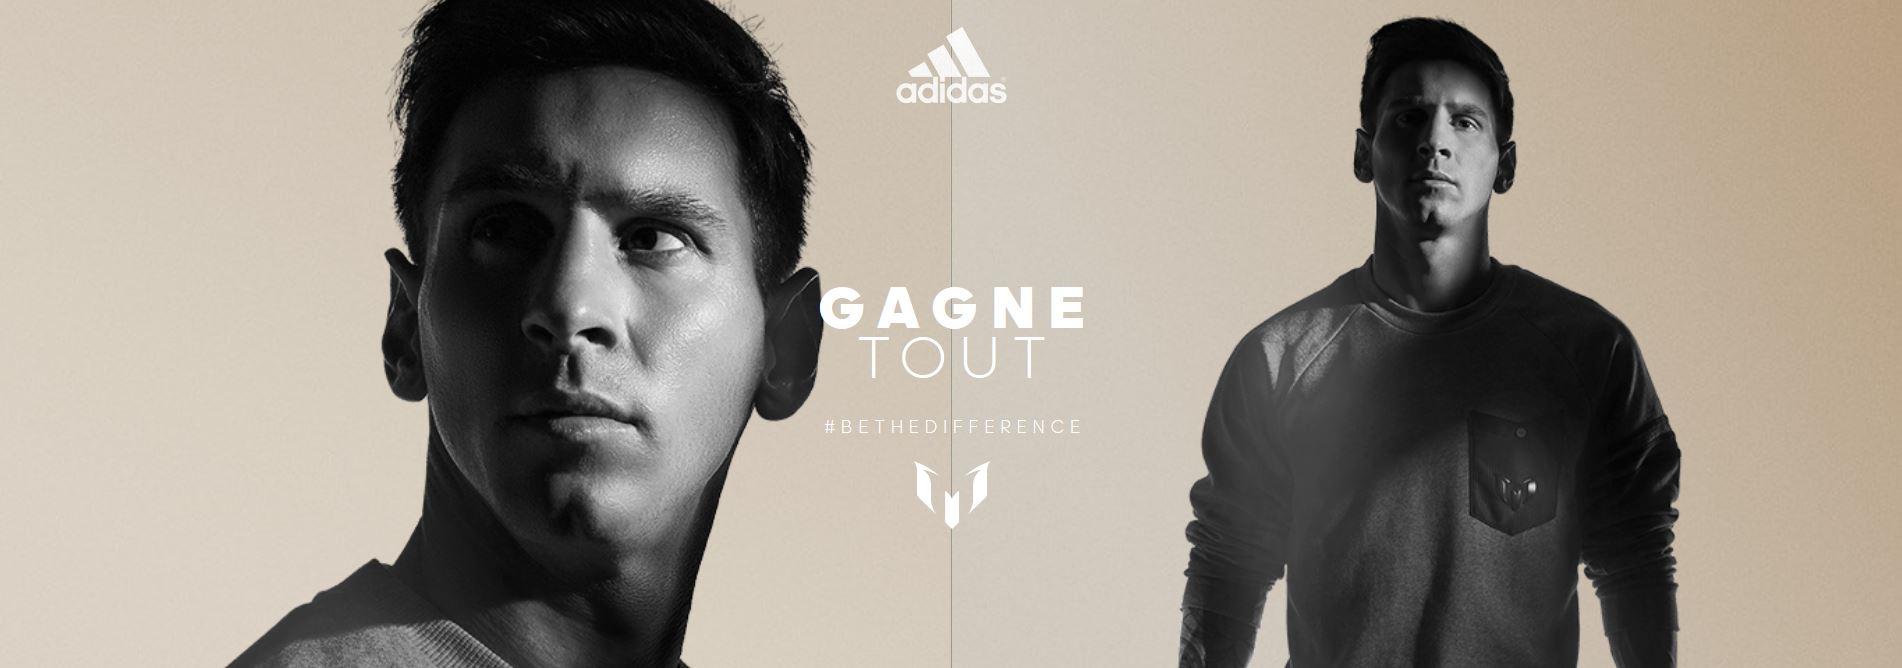 2015-06-08 11_56_33-Chaussure de football adidas messi15 _ Conçue pour gagner